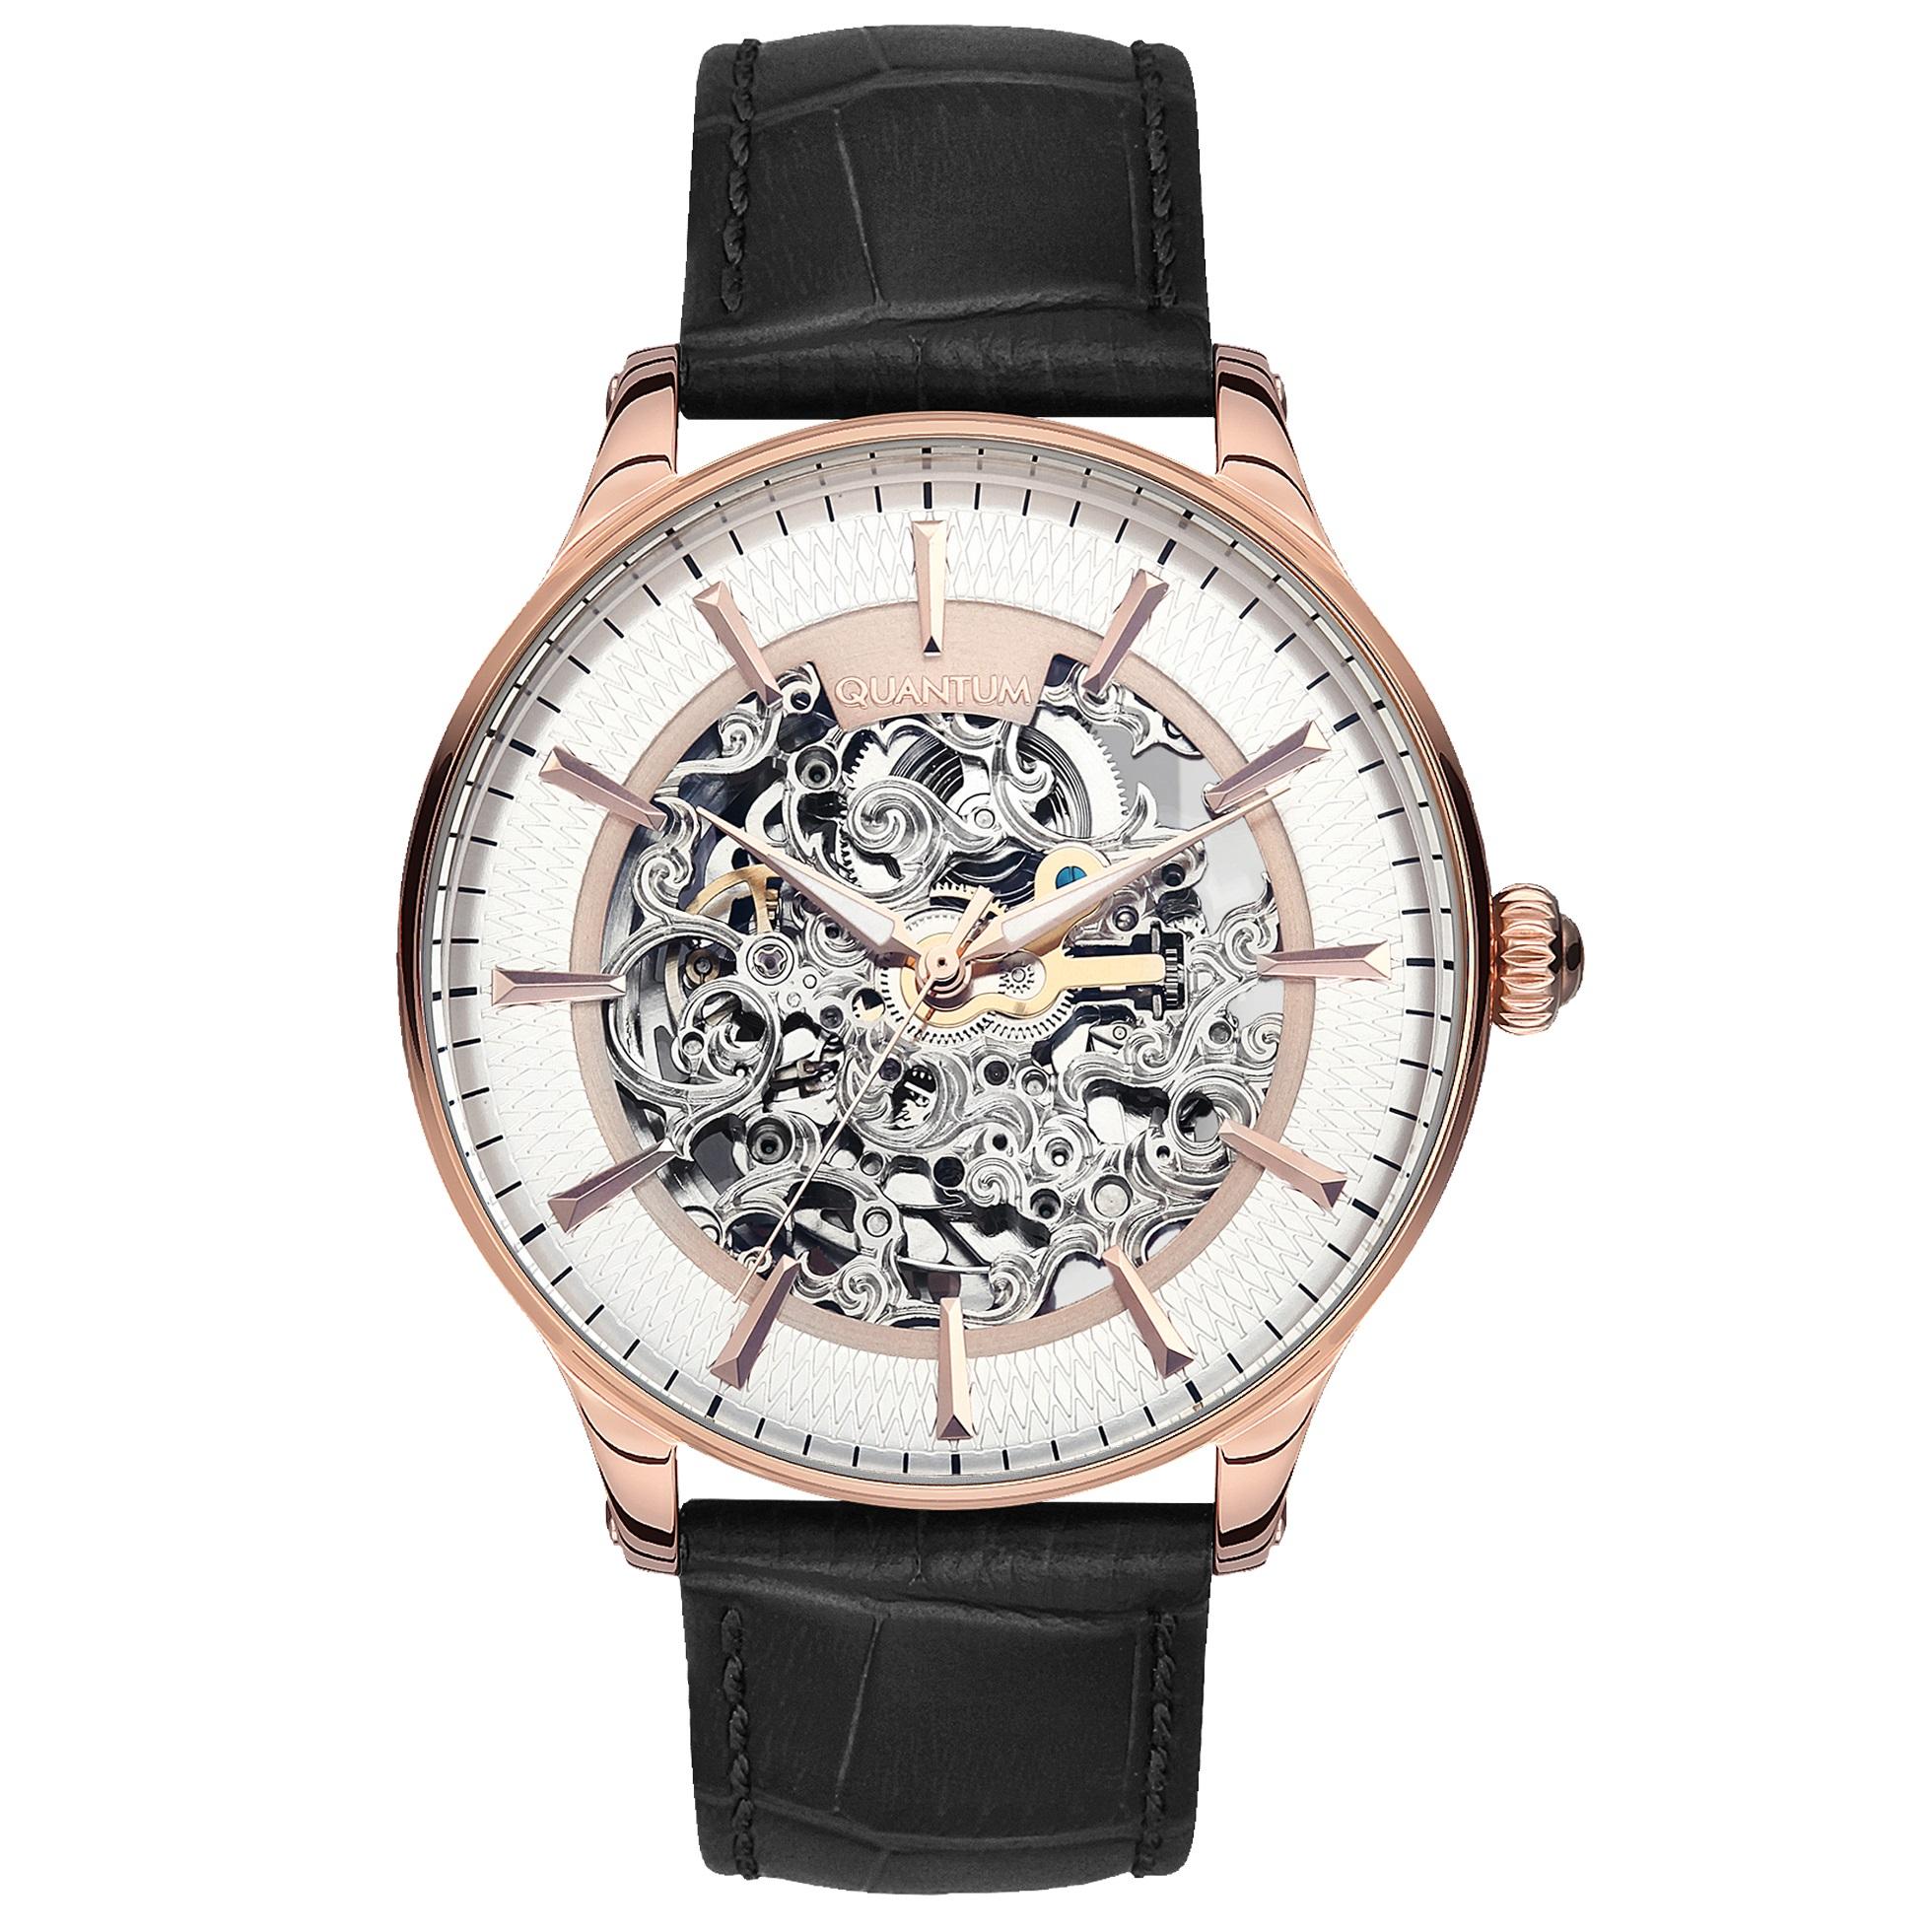 quantum-watch-adriko-automatic-skeleton-louri-mauro-QMG547.431